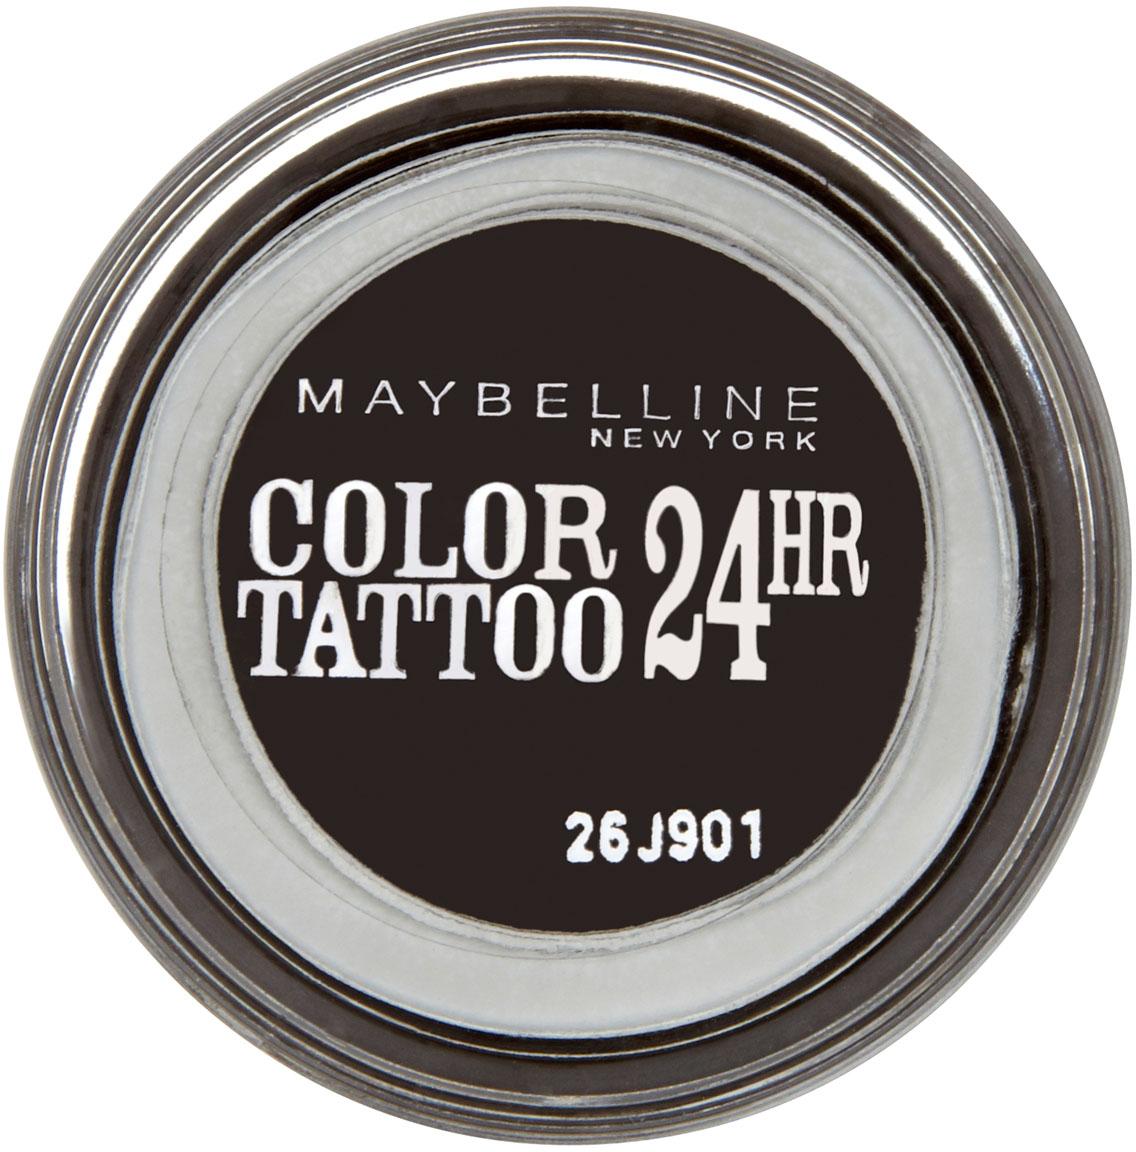 Maybelline New York Тени для век Color Tattoo 24 часа, оттенок 60, Бессменный черный, 4 мл тени maybelline new york тени для век color tattoo оттенок 91 розовый зефир 4 мл